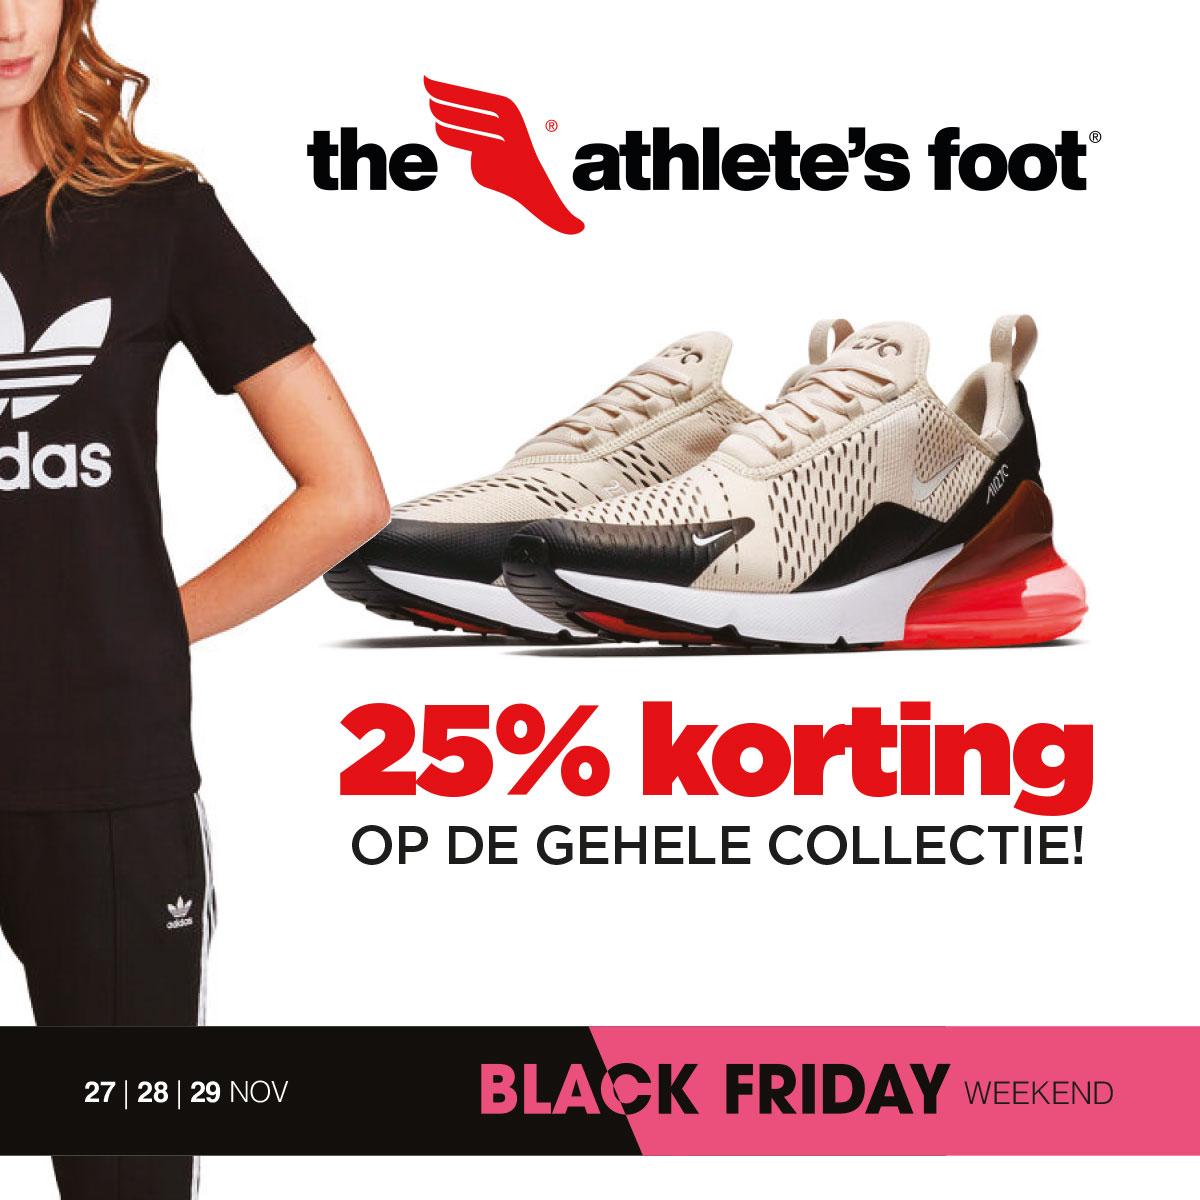 FB-banner-Athletes-foot